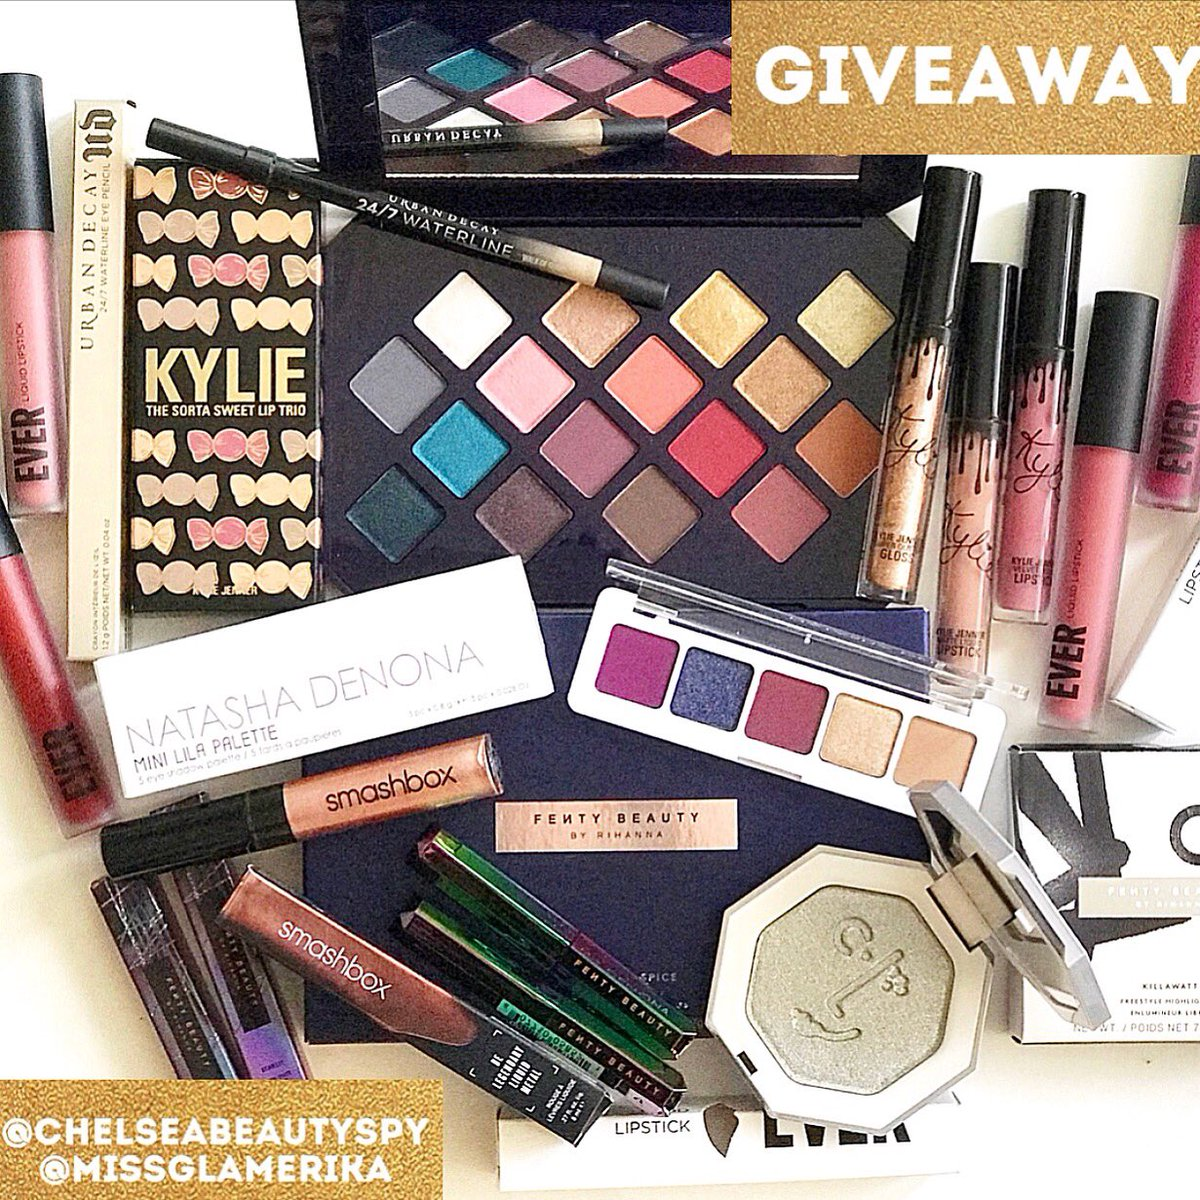 Makeupgiveaway Photos And Hastag Eyesential Eyebrush Set Chelsea Scott Happy Friday New Giveaway Fenty Kyliepictwittercom Oqq7p8zg5m